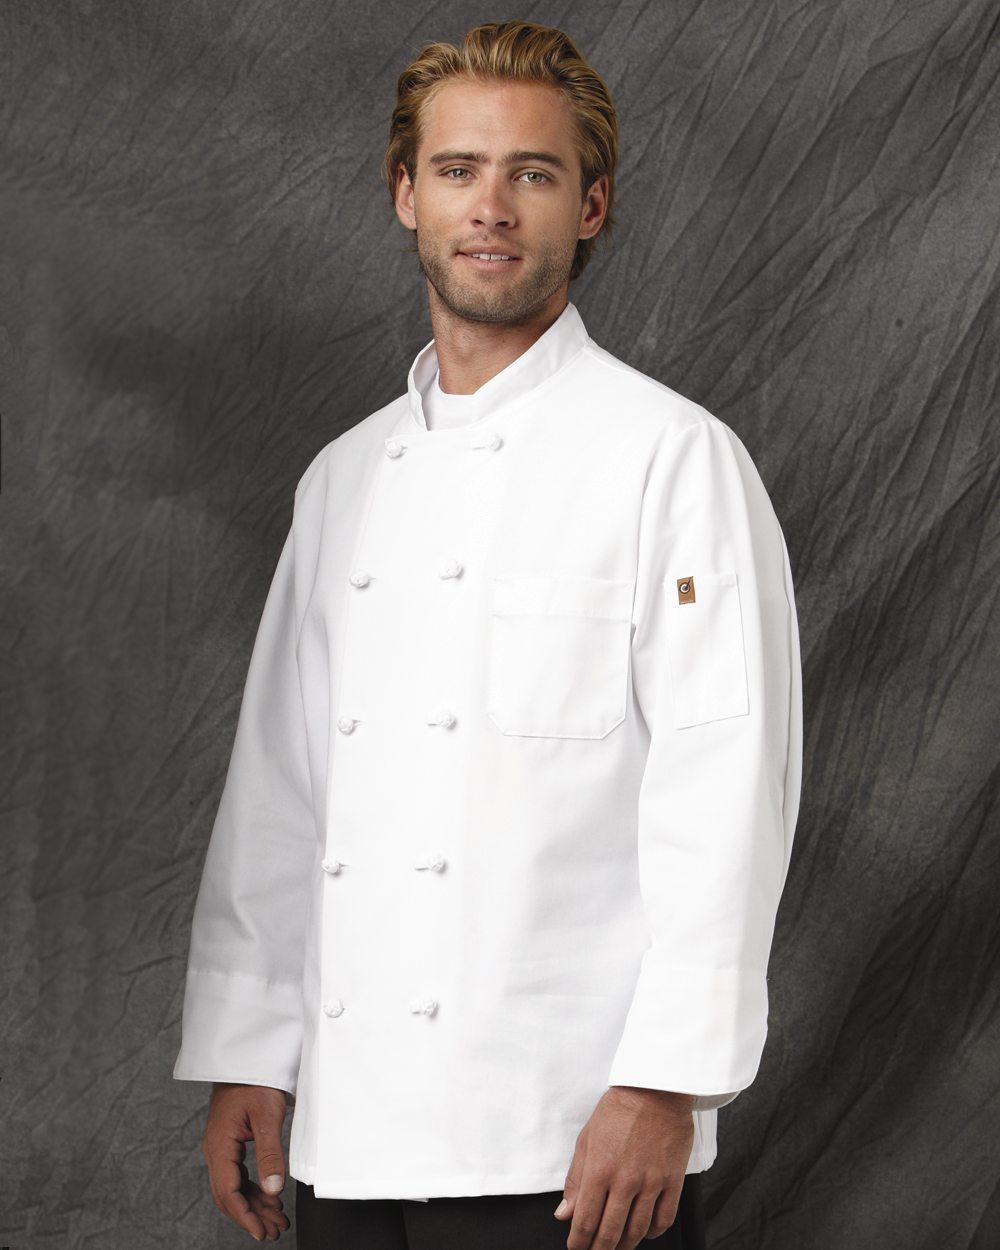 Chef Designs 0420 Executive Chef Coat